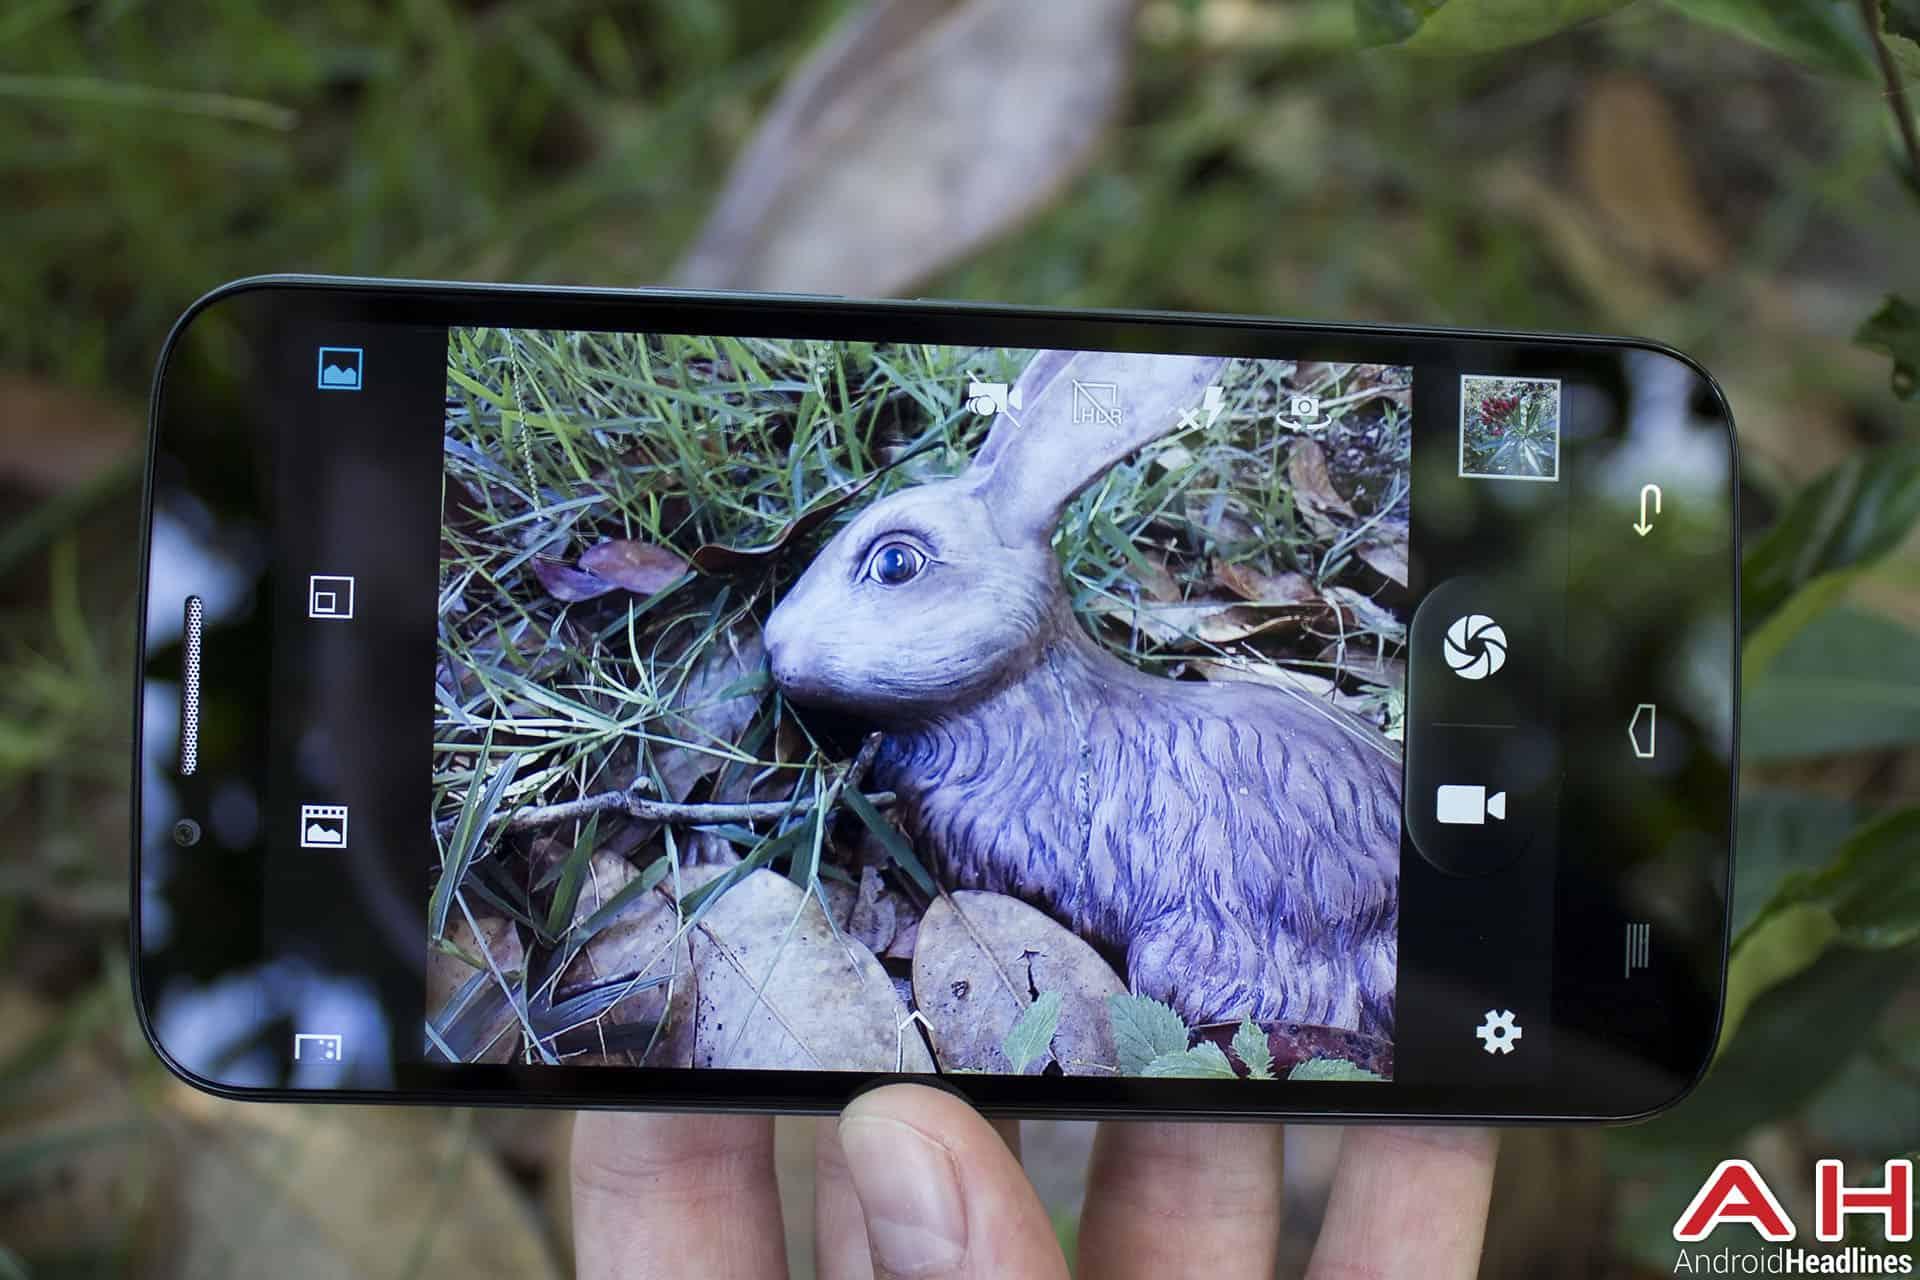 Umi-emax-review-AH-camera